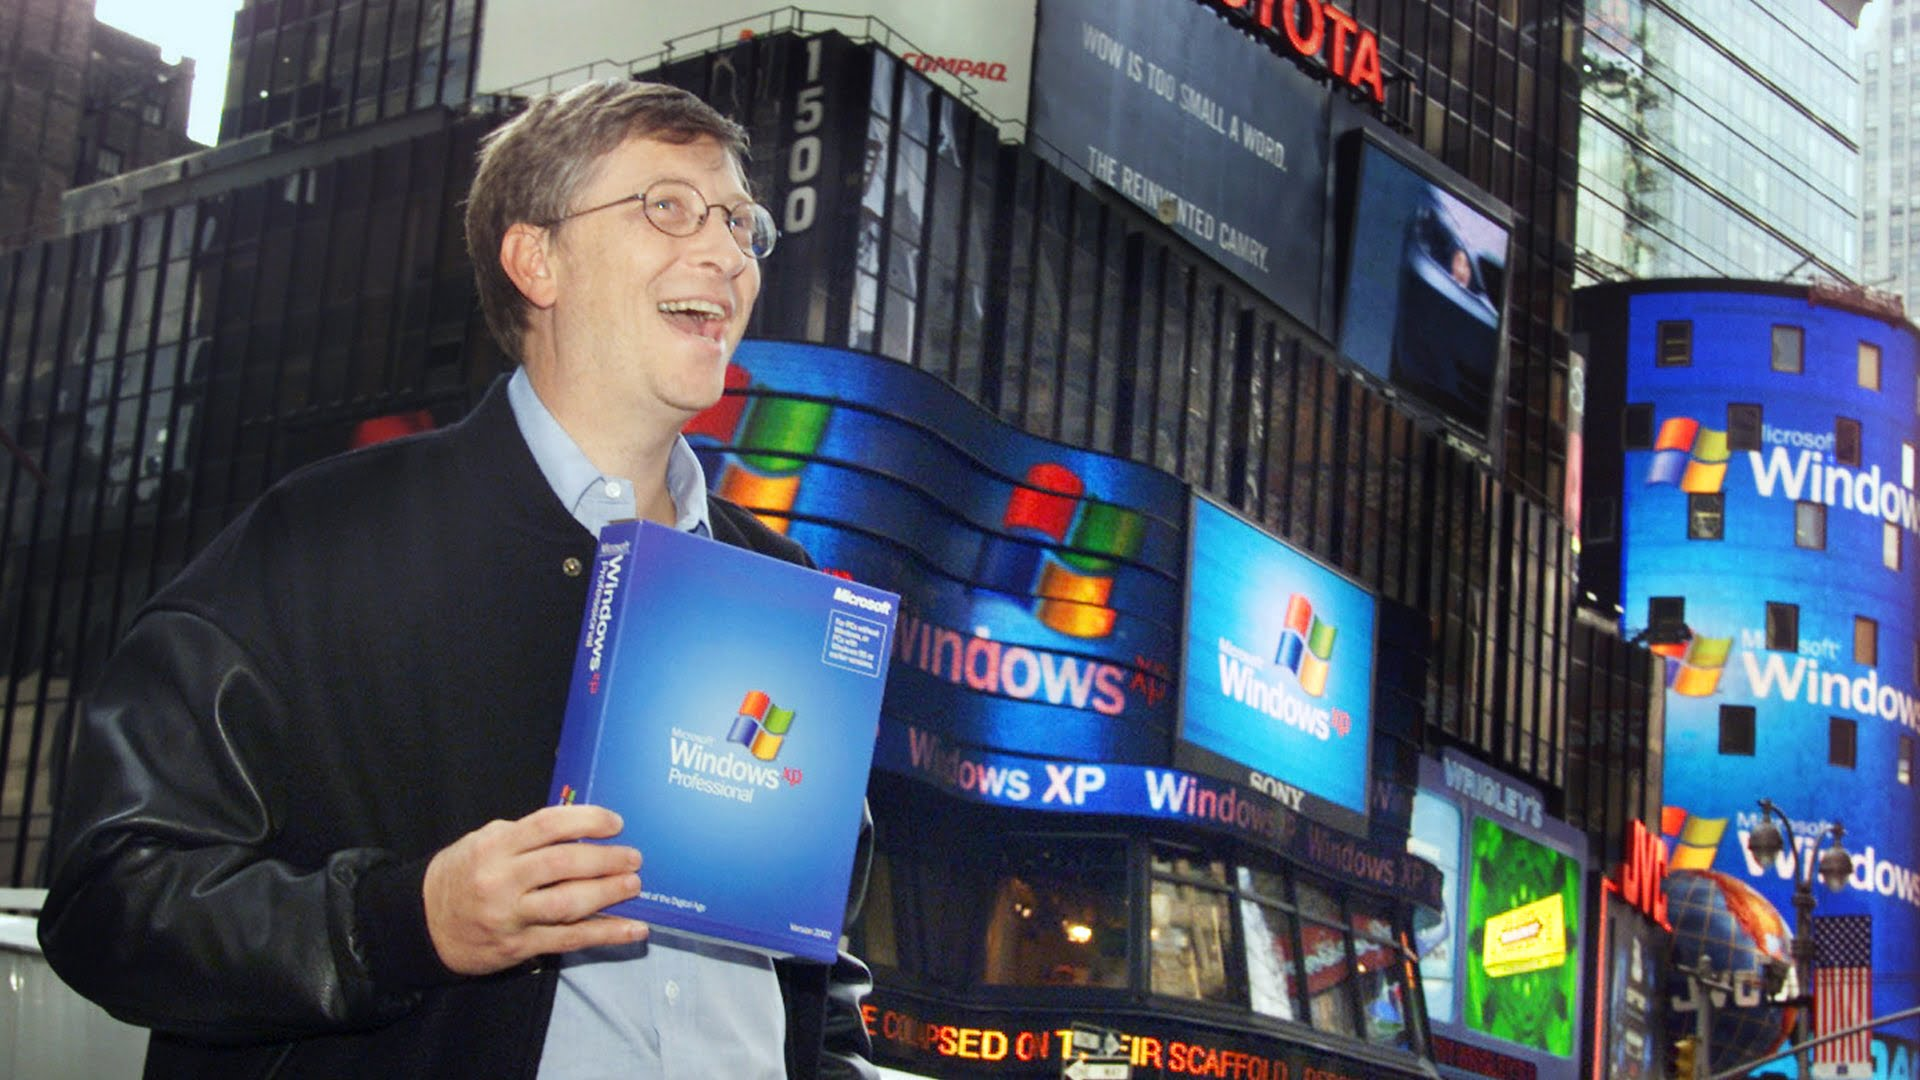 Bill Gates promocionando a Windows XP